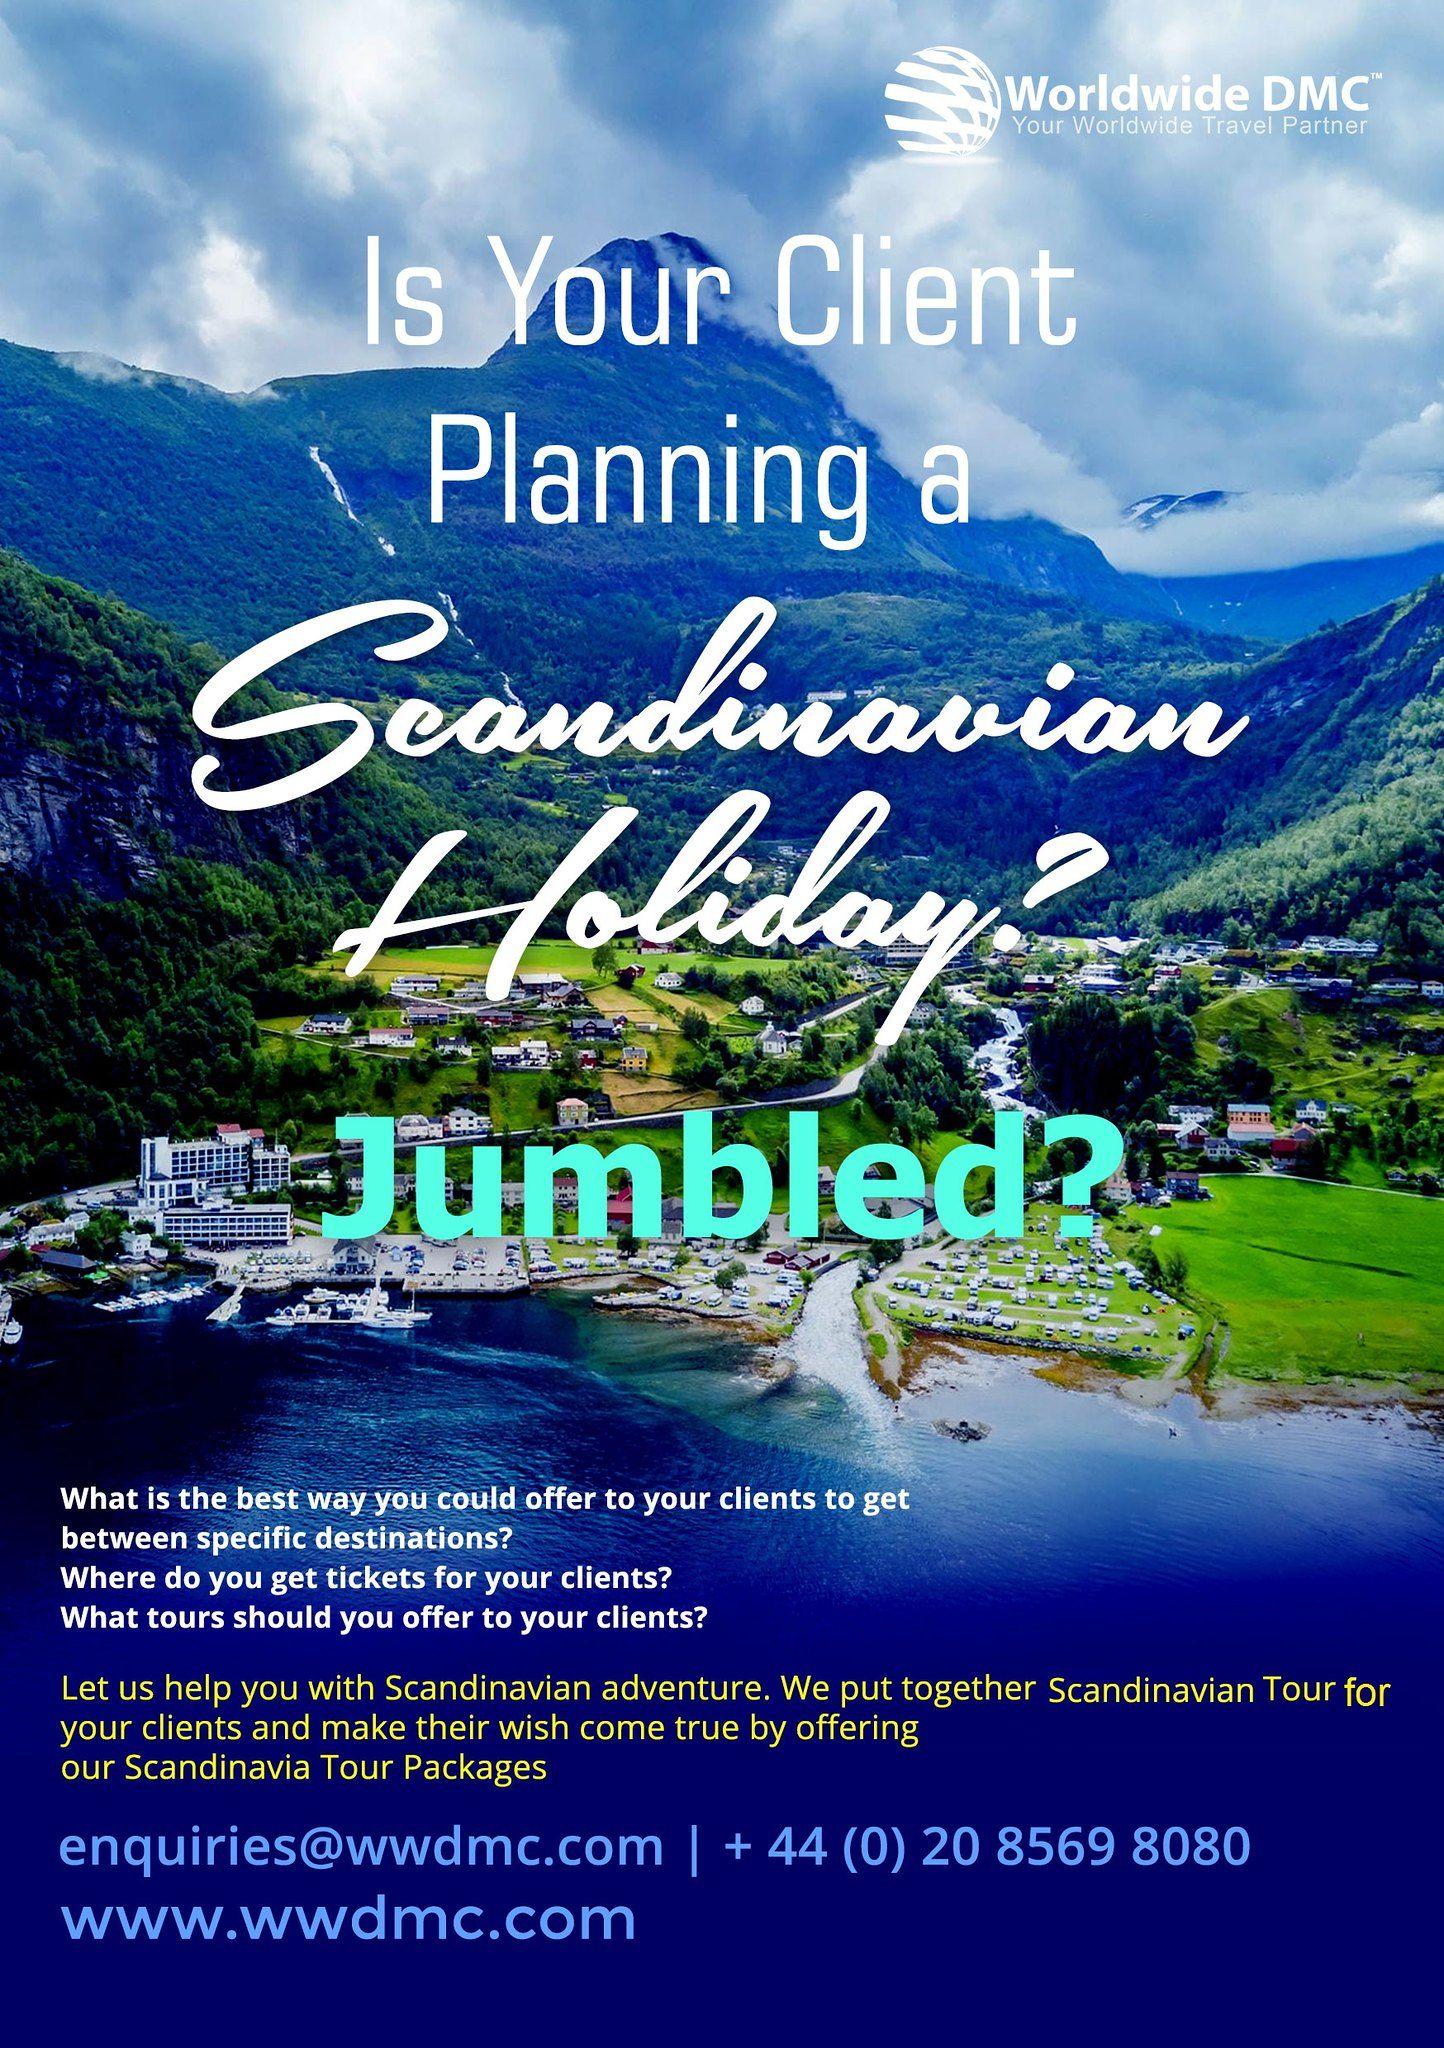 Scandinavia Dmc Norway Sweden Denmark Iceland Finland Worldwide Dmc Europe Tours Worldwide Travel Scandinavia